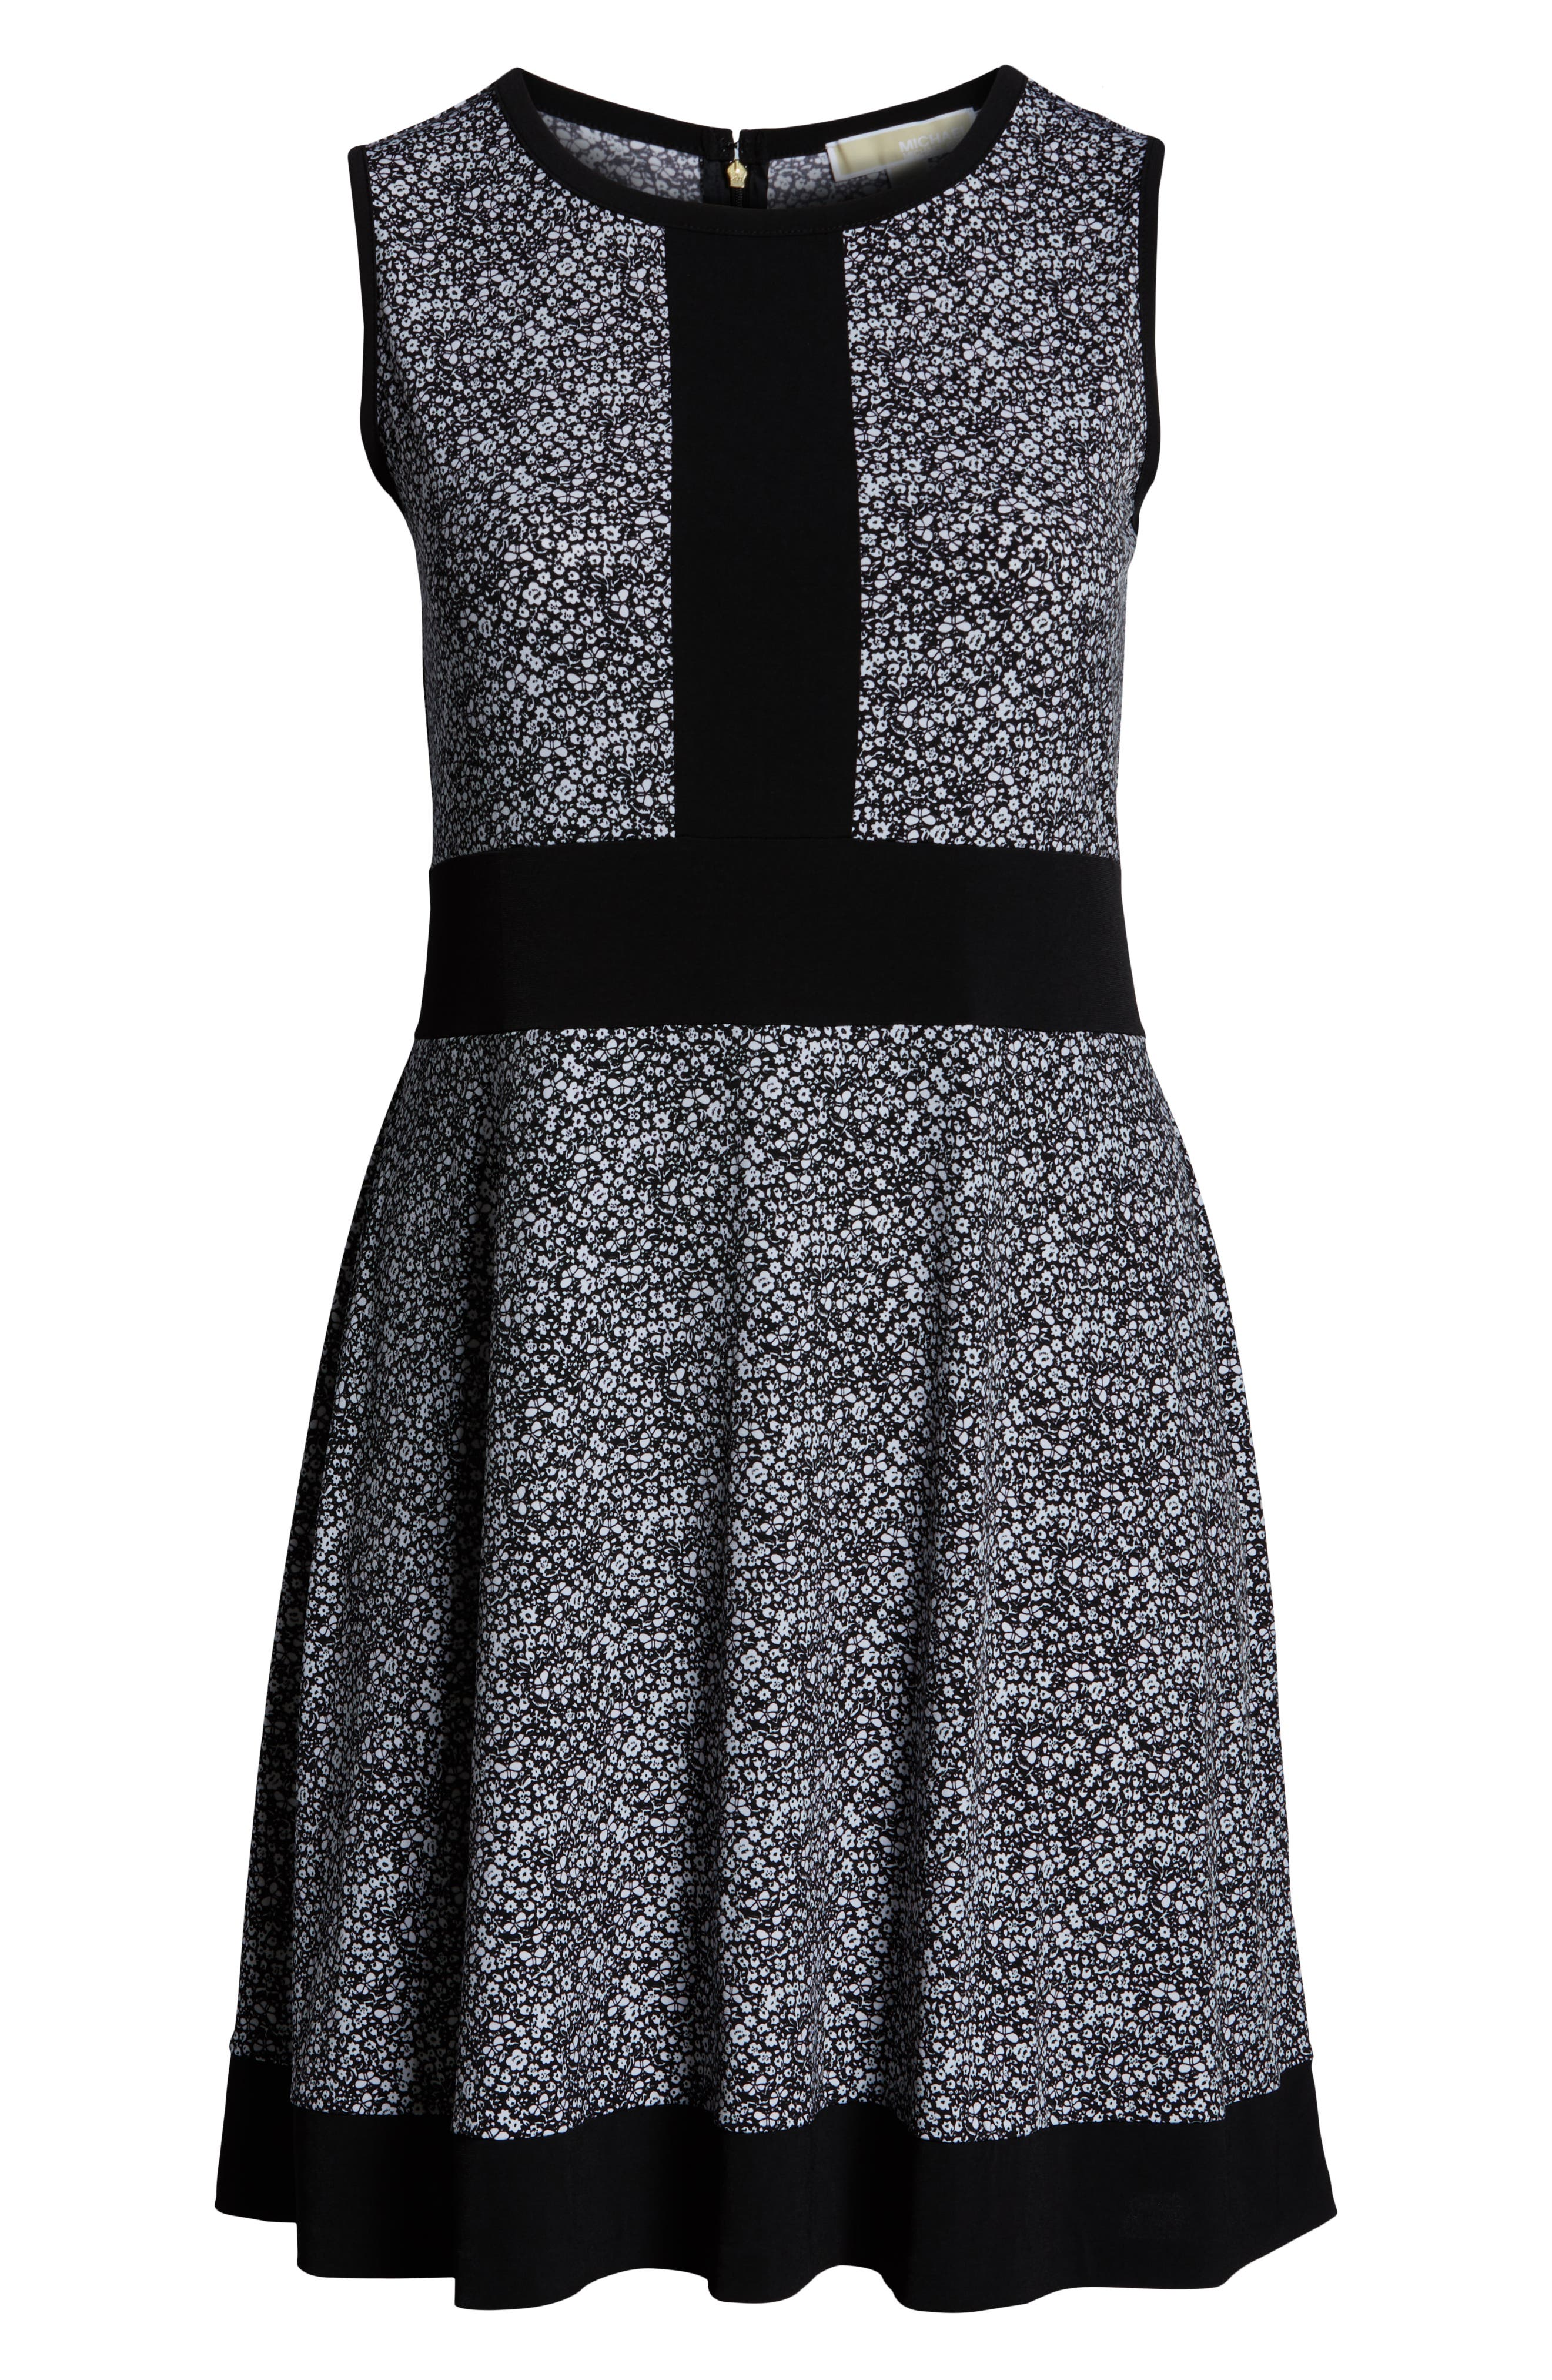 MICHAEL MICHAEL KORS, Spring Twist Dress, Alternate thumbnail 7, color, BLACK/ WHITE